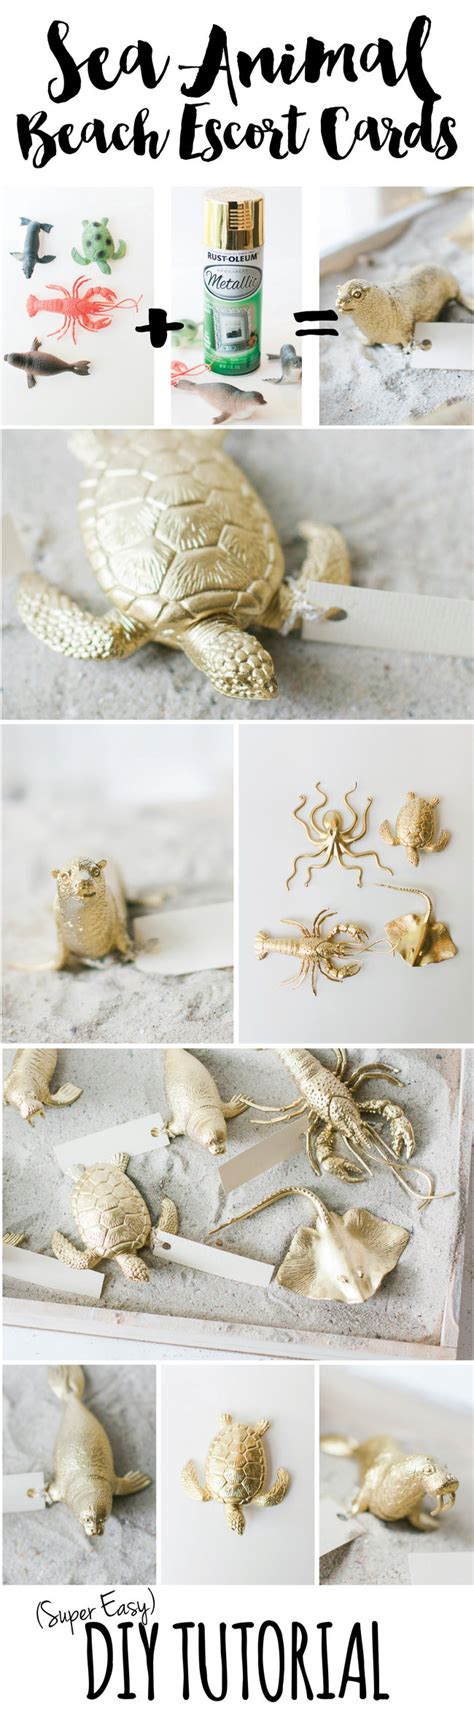 easy diy plastic sea animal beach wedding escort card tutorial